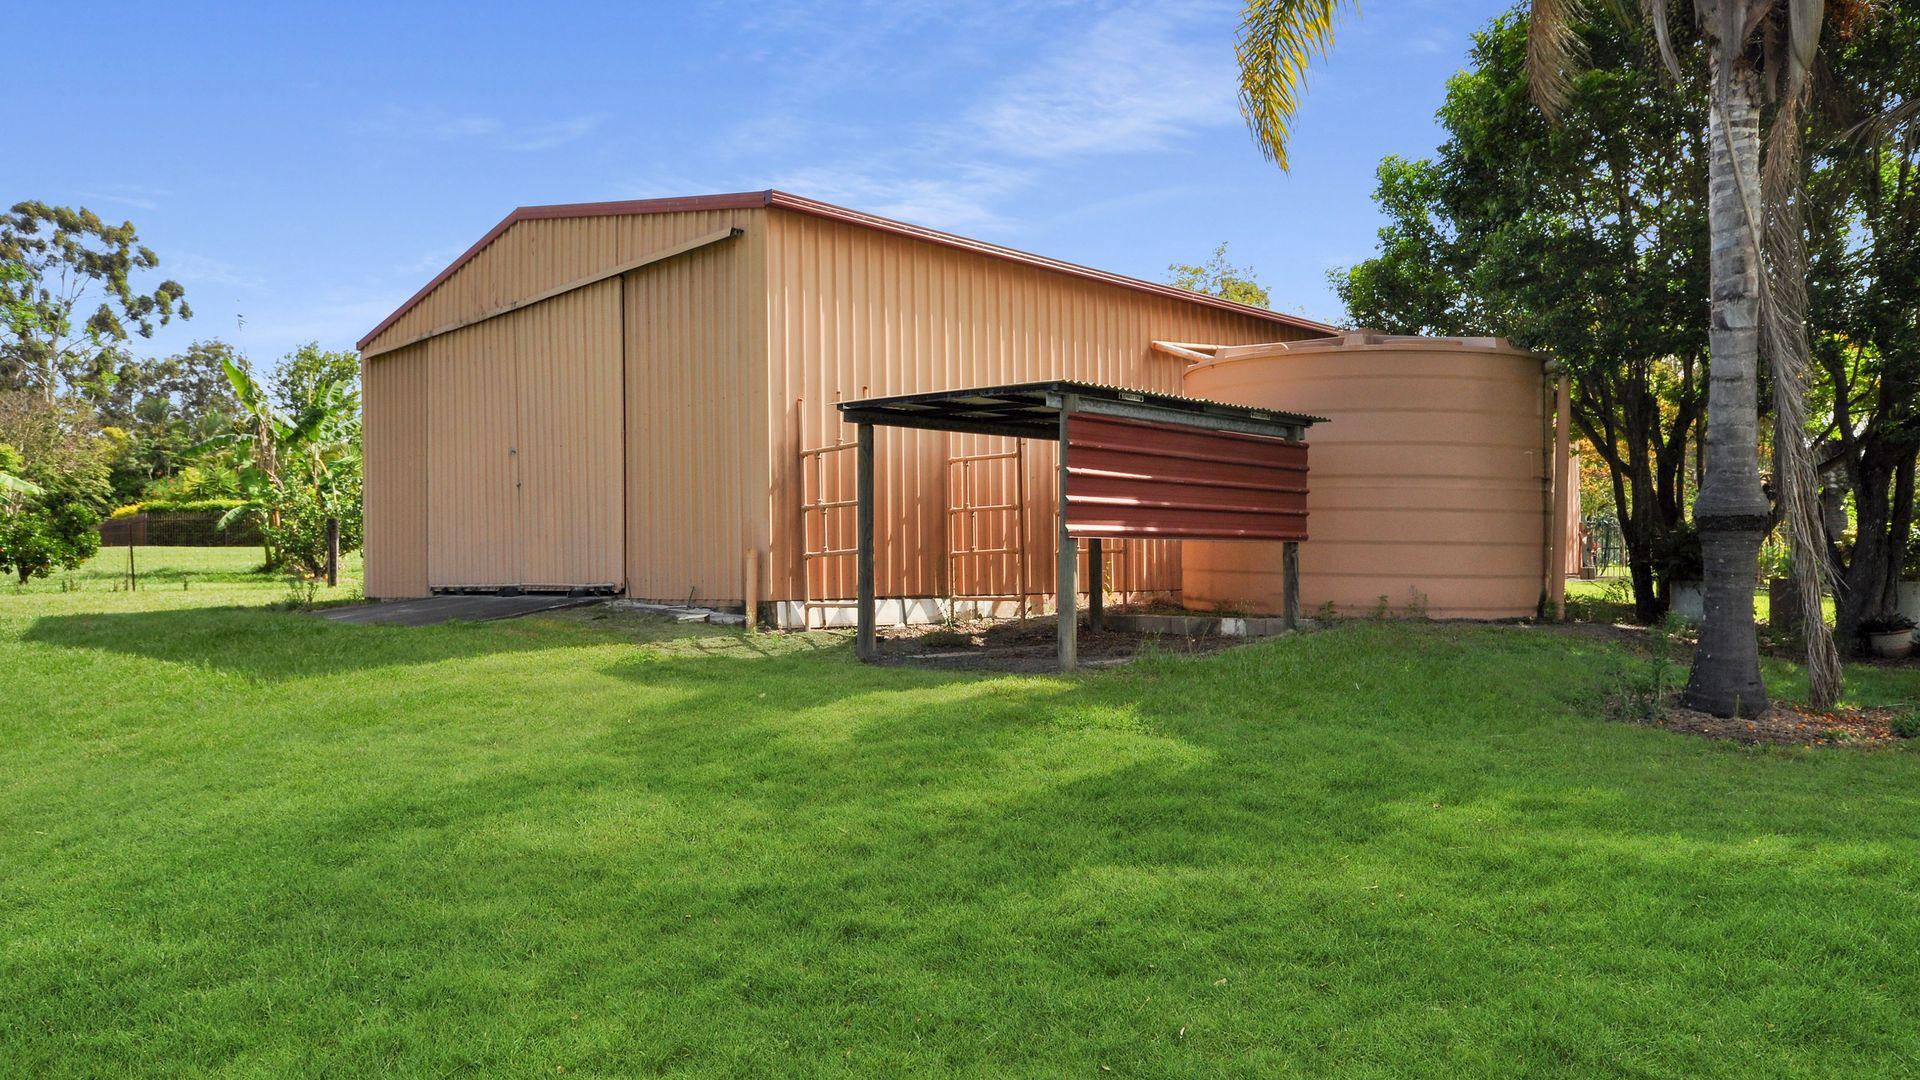 11 Alvisio Court, Narangba QLD 4504, Image 2